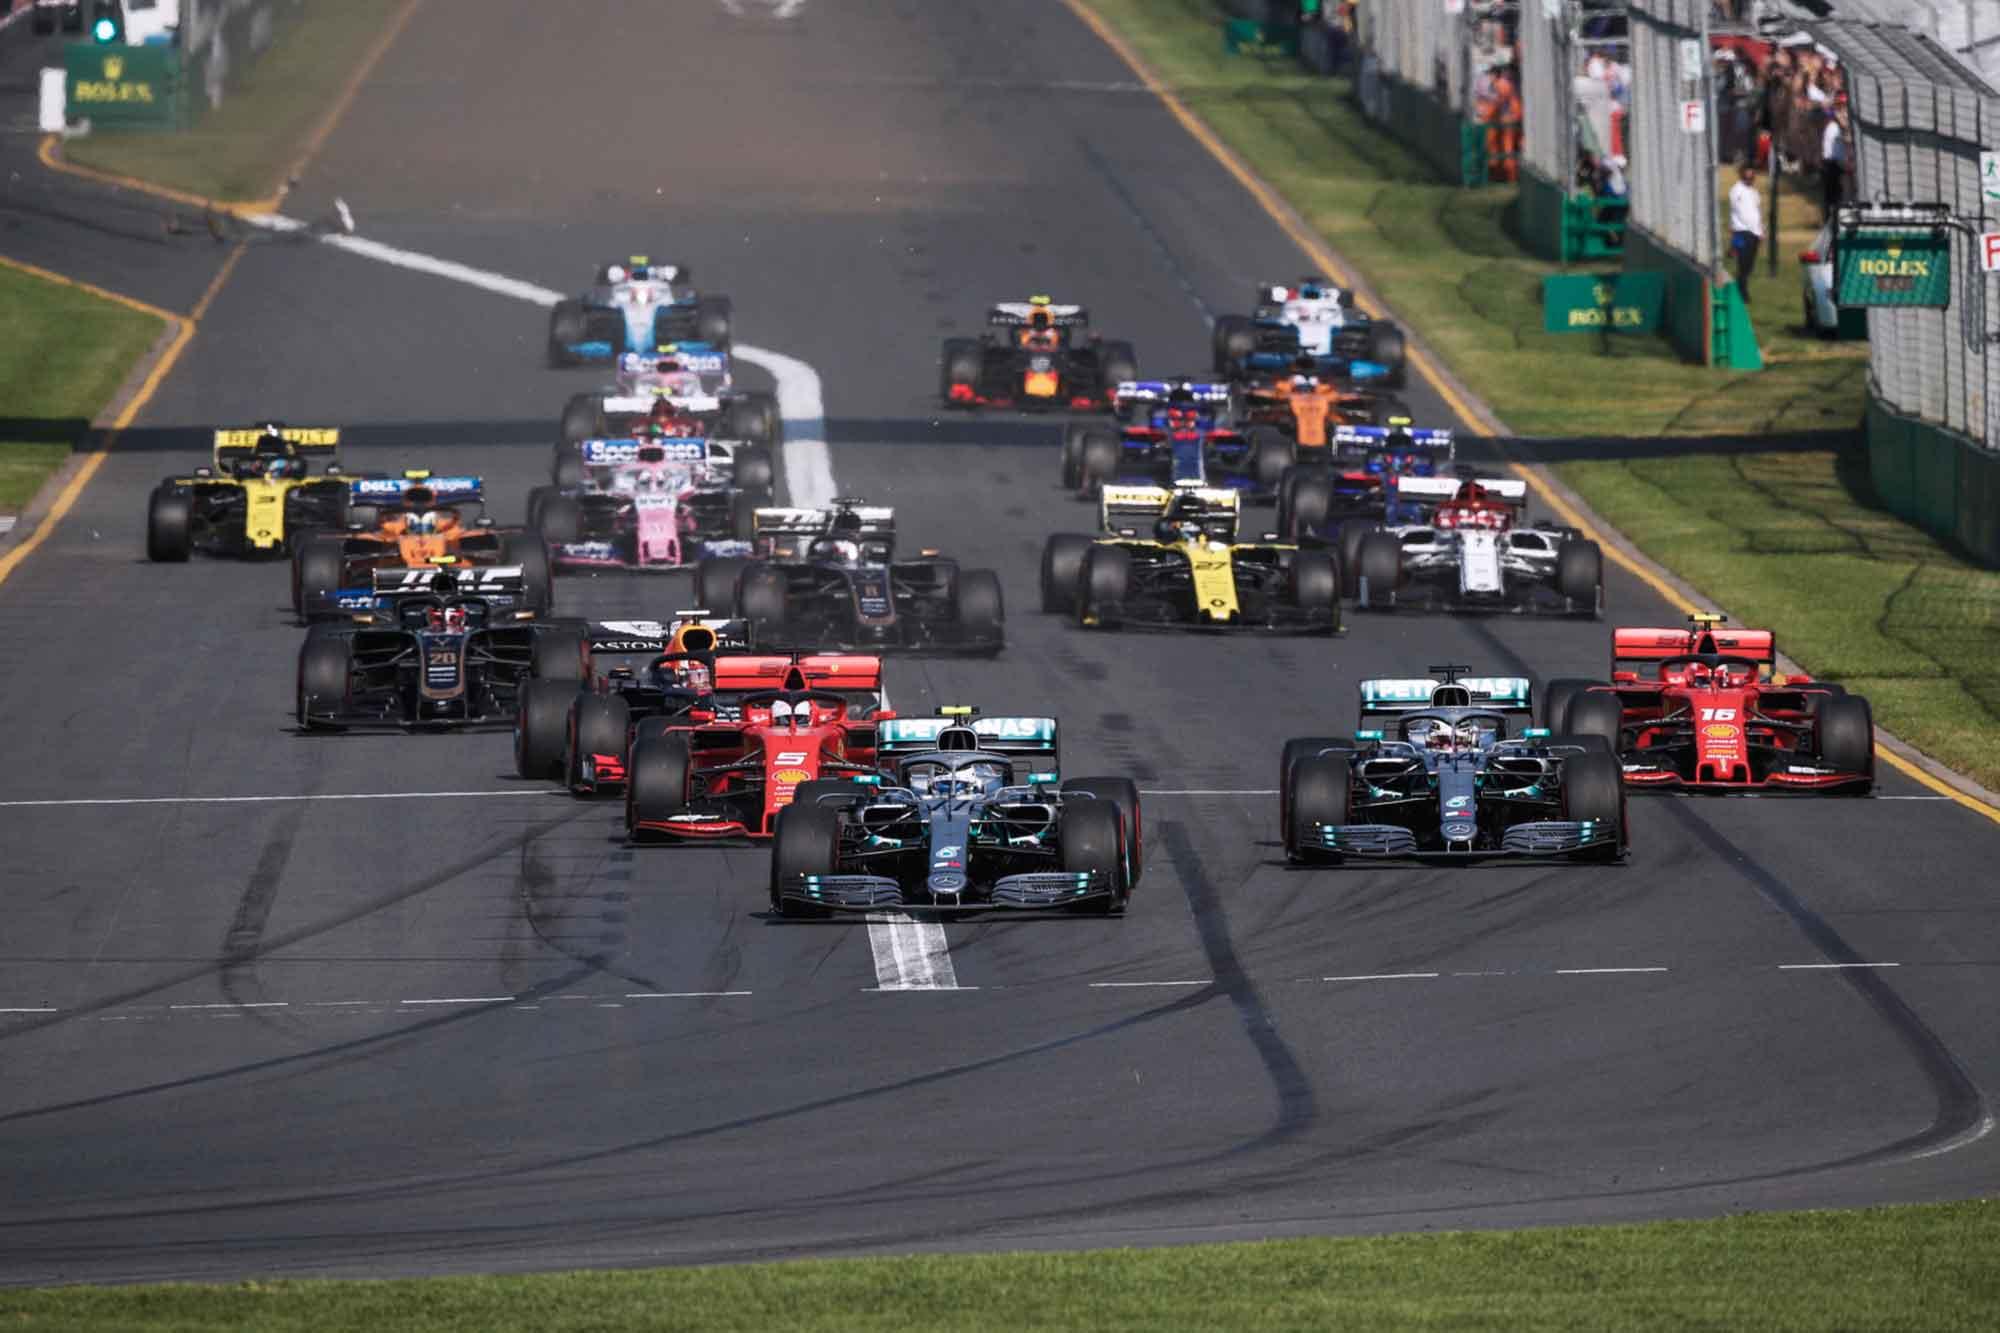 GP de Melbourne de F1 (3)